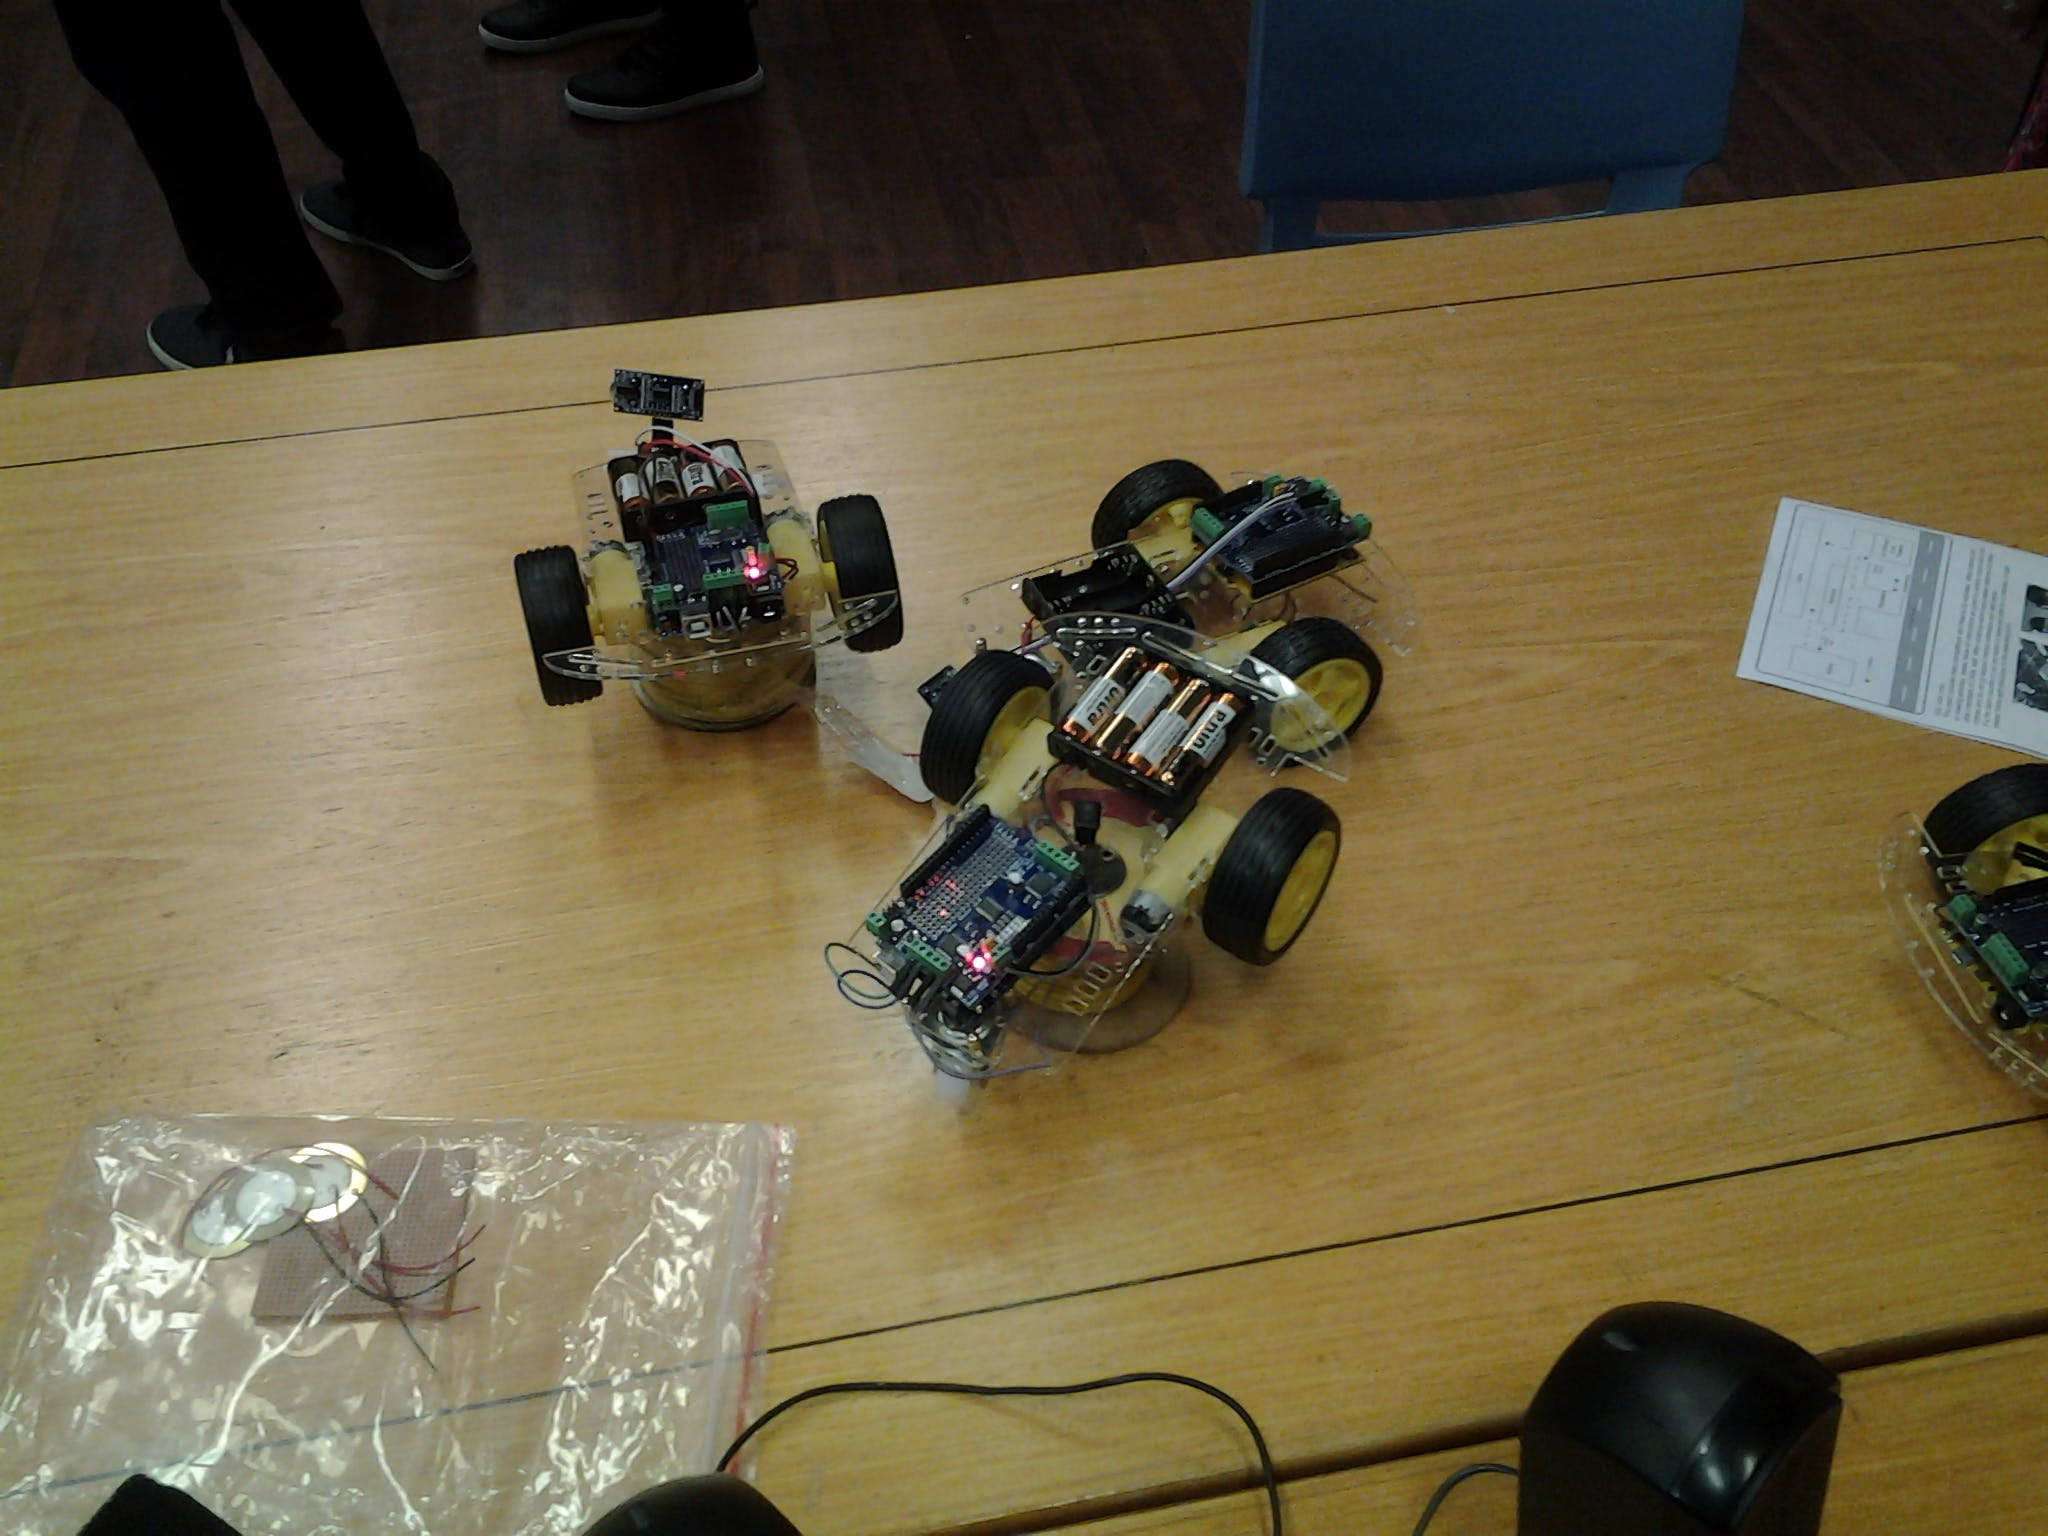 Demos showing Arduino 101 with MotorShield Sensors are from MikroElektronika